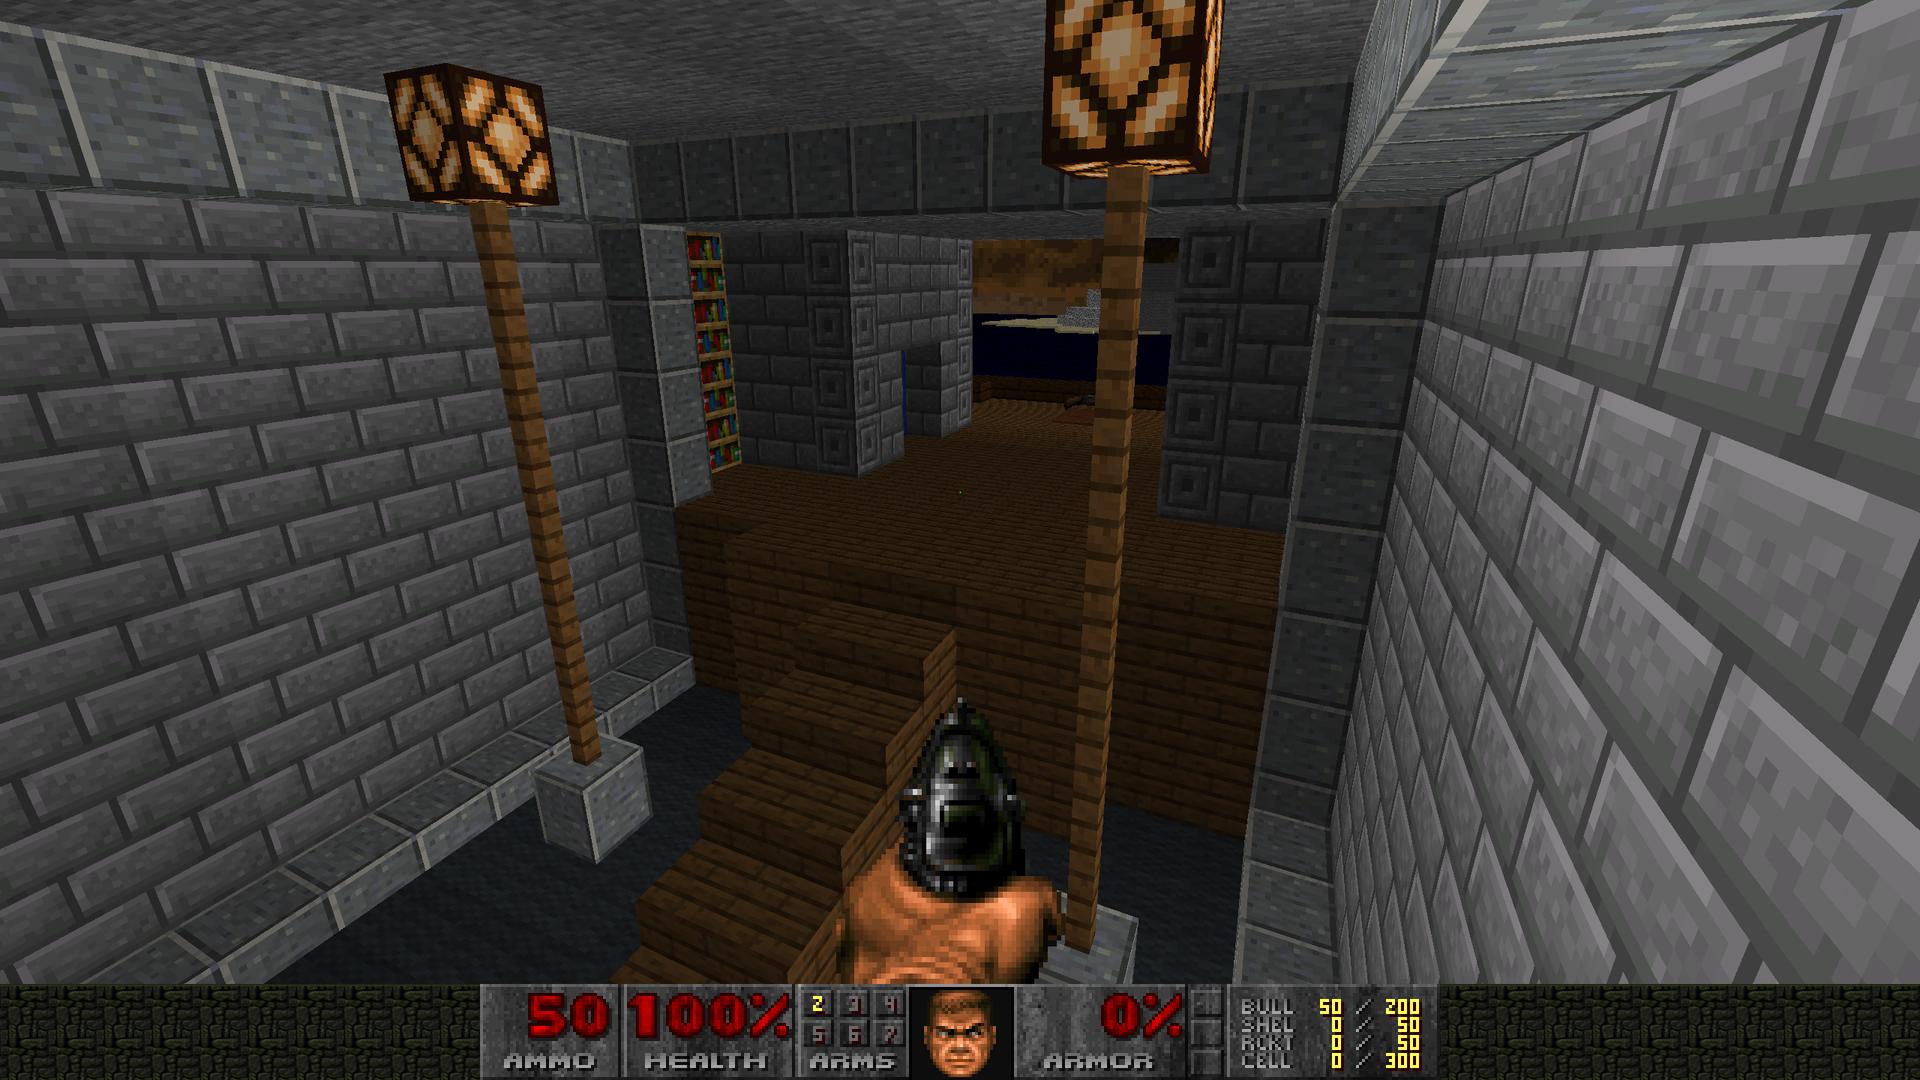 Screenshot_Doom_20200331_144544.png.22ba7a50a2f9ba0d78b53a962e08fa13.png